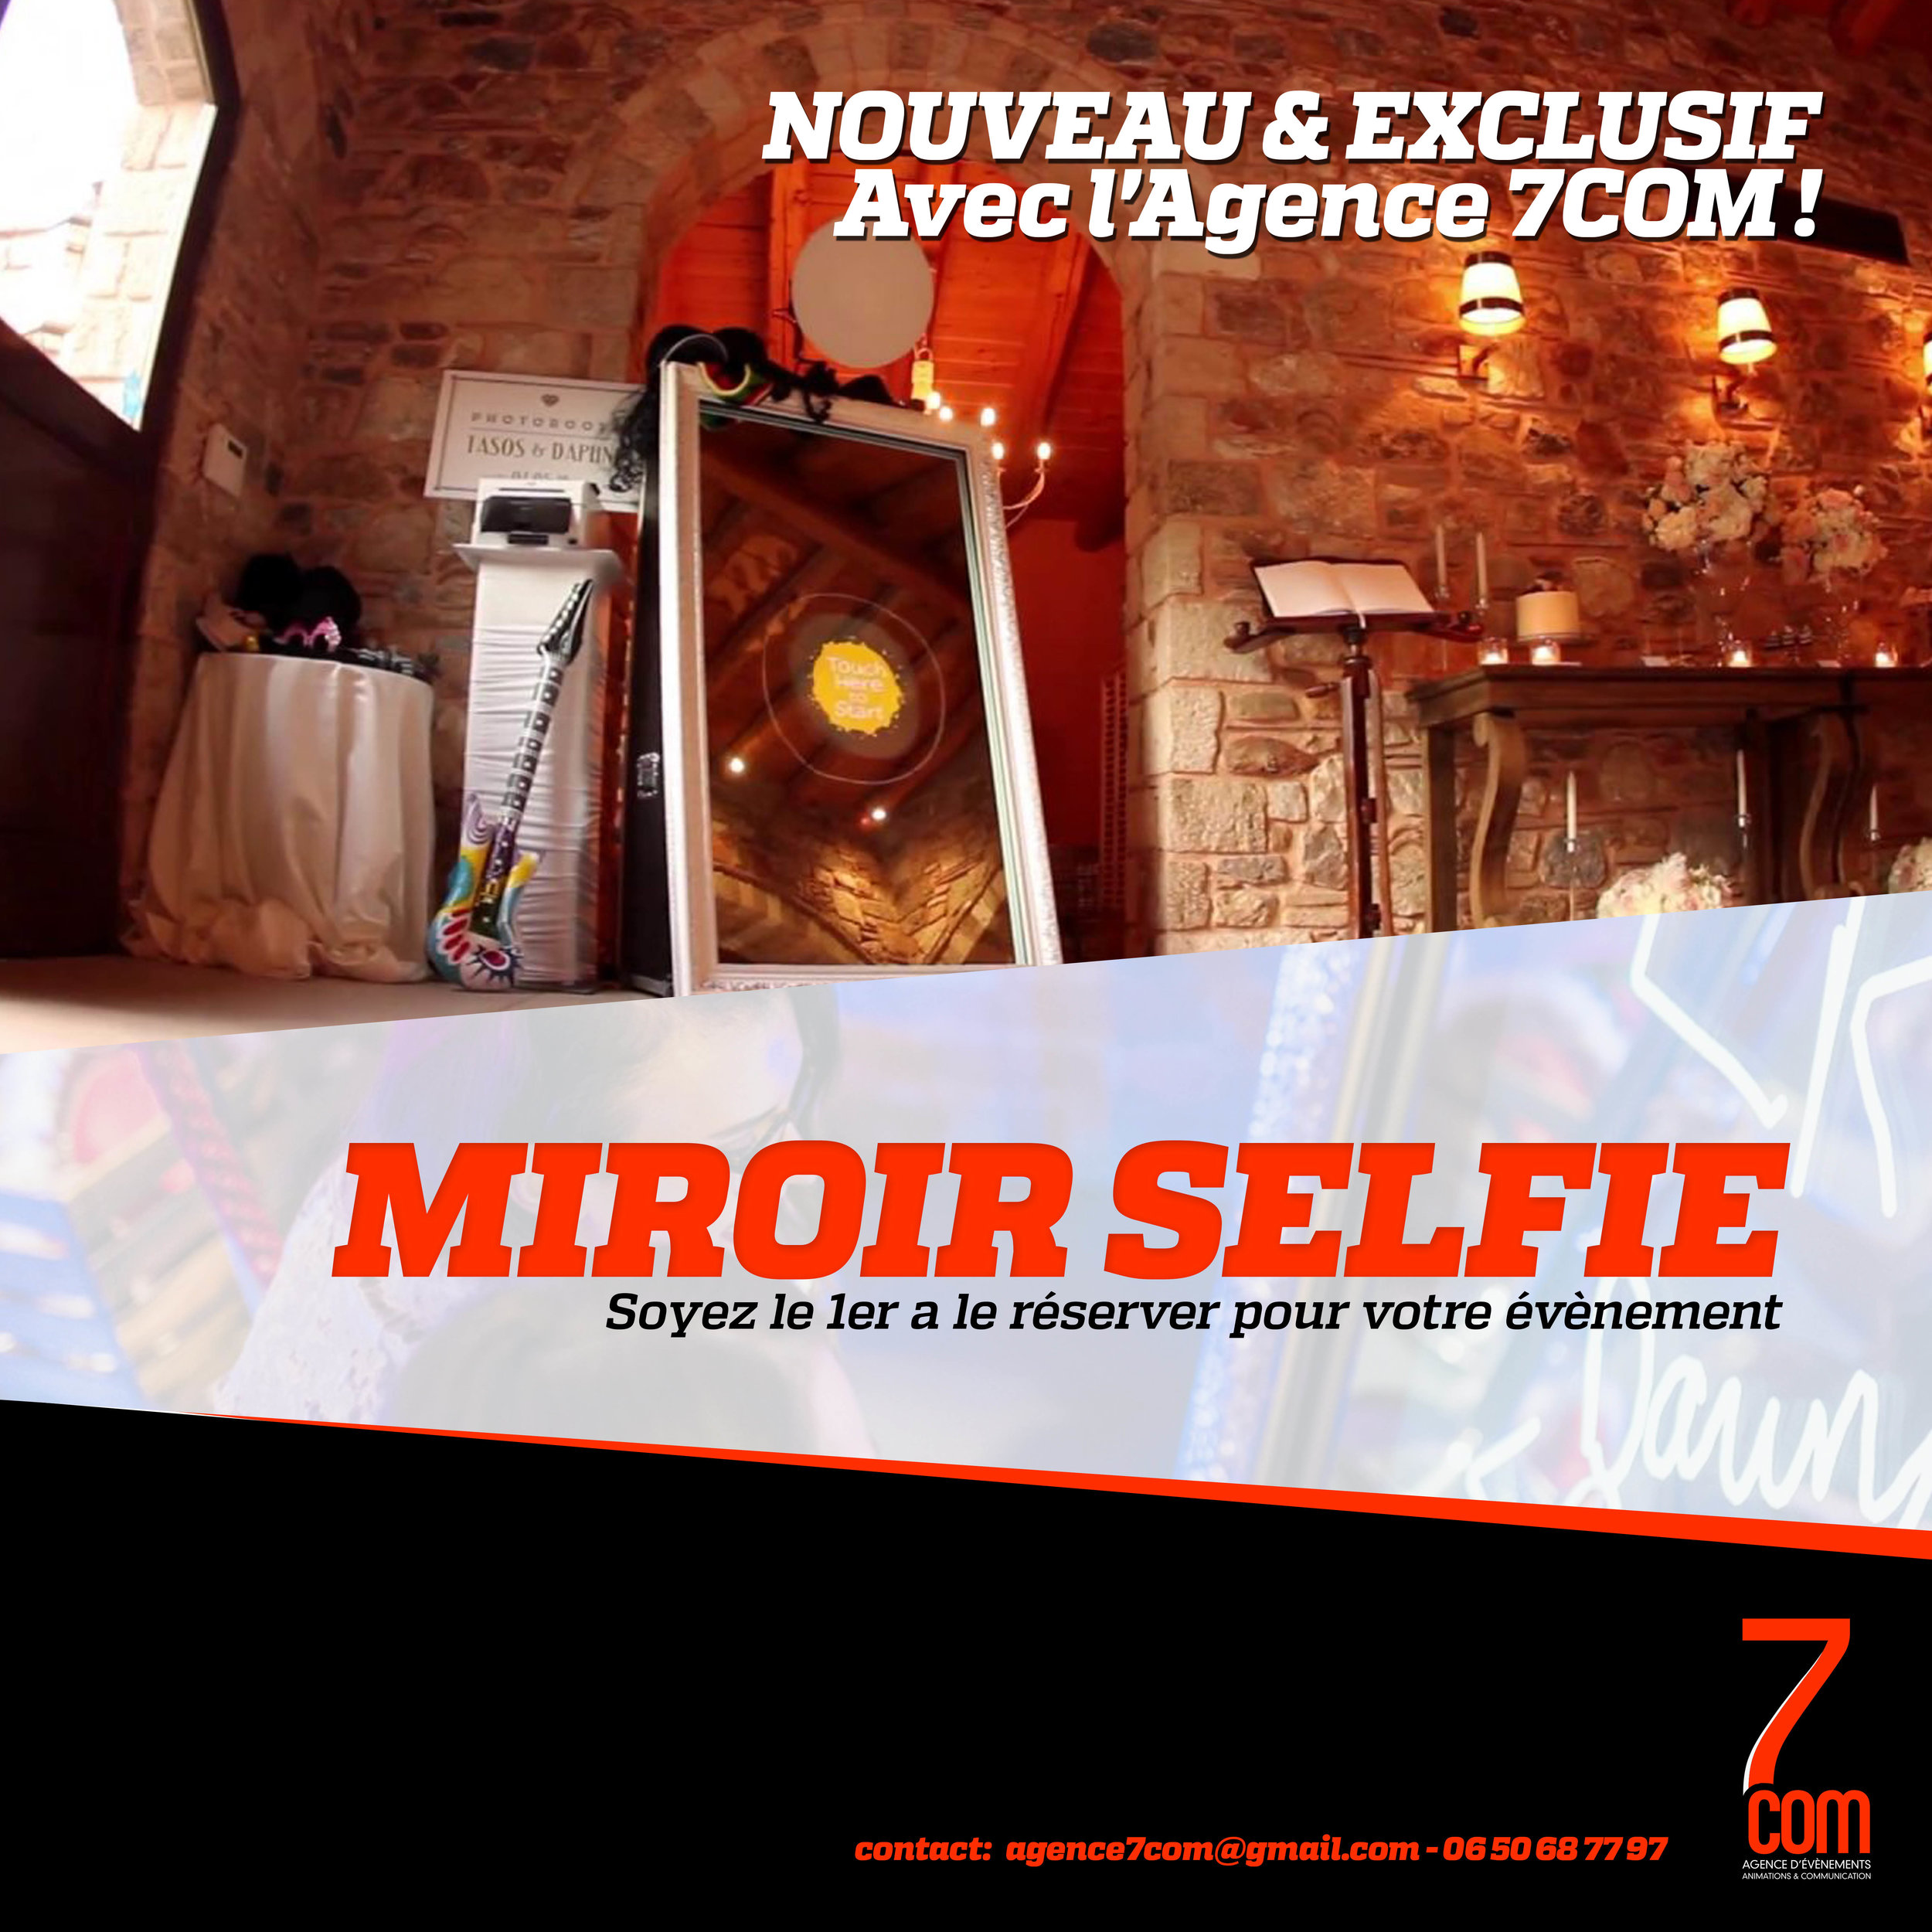 miroirselfieFB.jpg